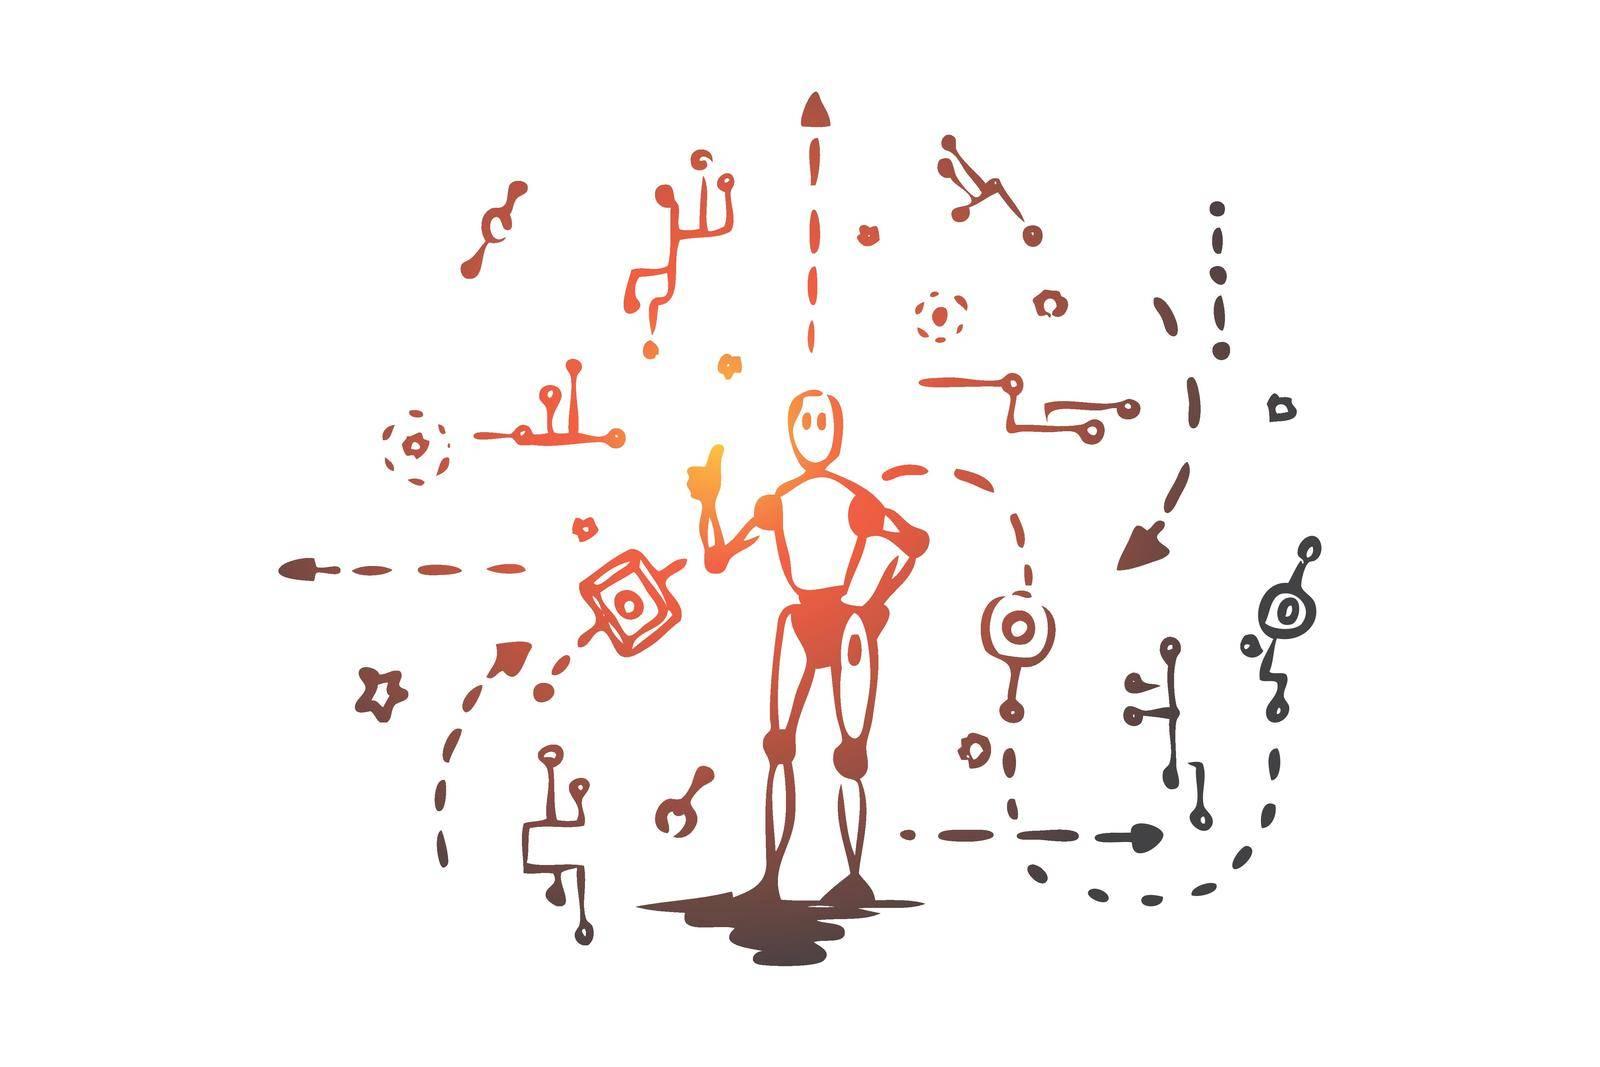 Scheme, machine, robot, technology, android concept. Hand drawn isolated vector. by Vasilyeva